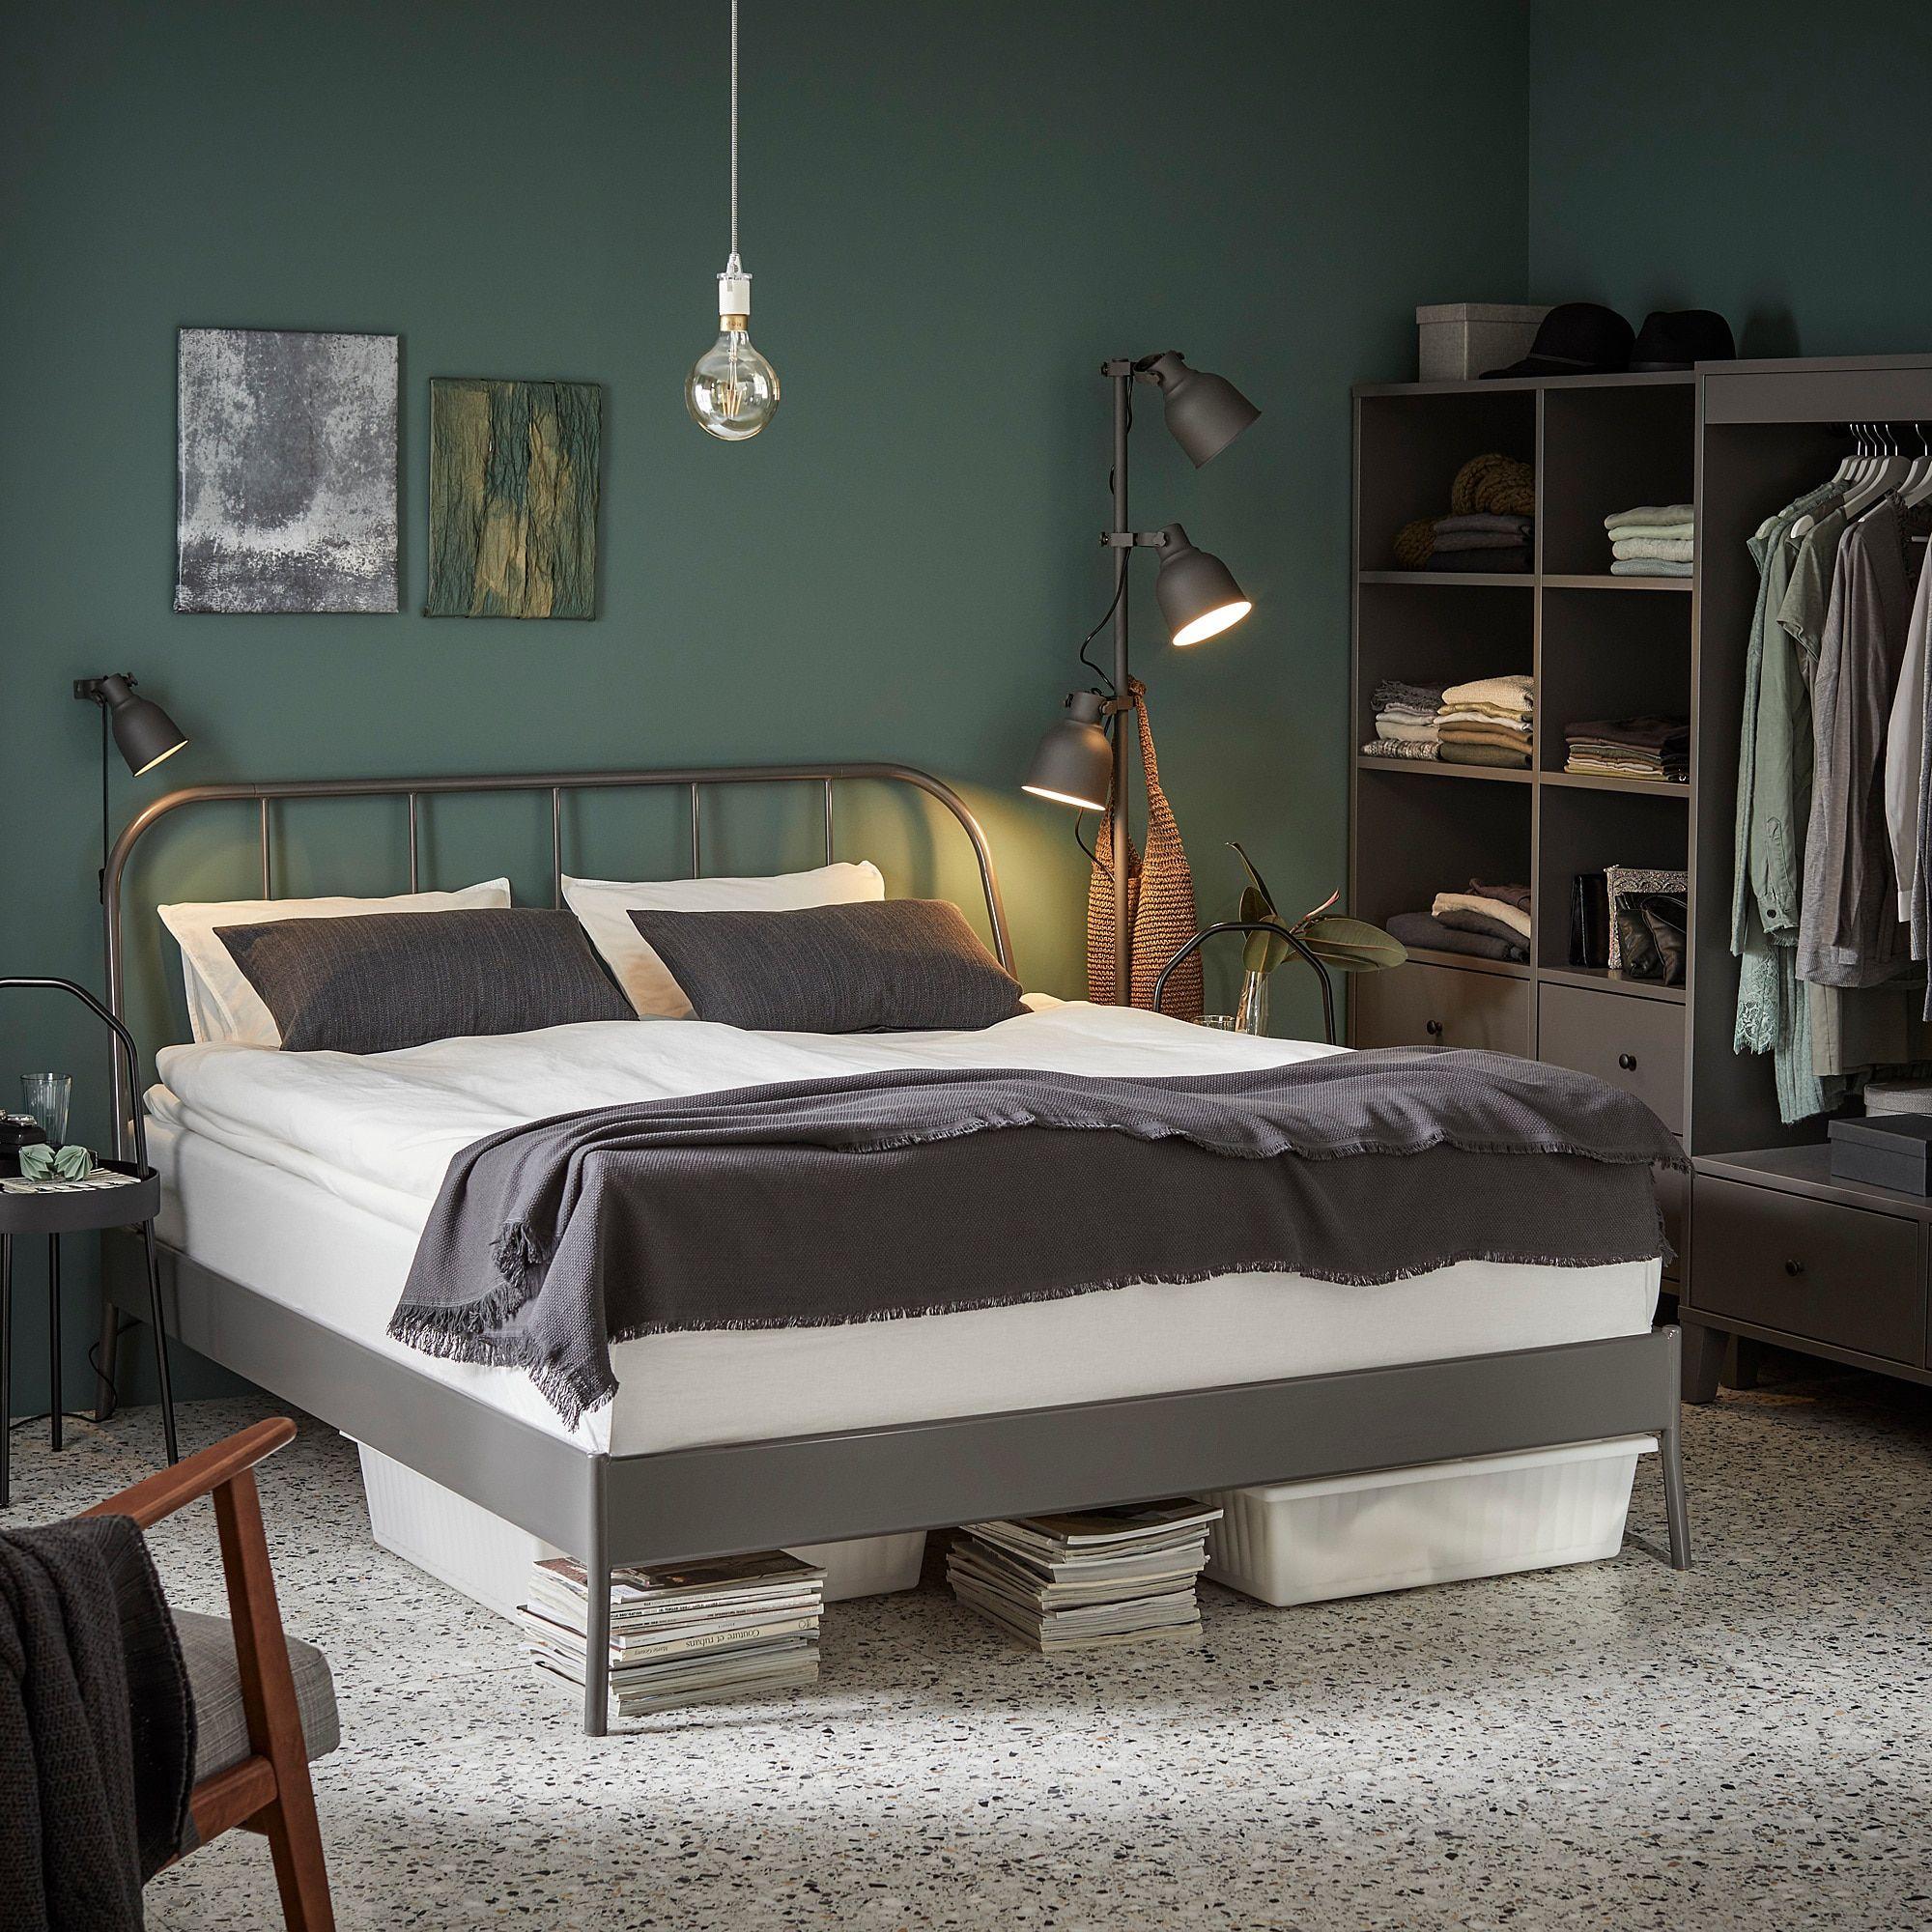 KOPARDAL Bed frame gray, Lönset Queen Bed frame